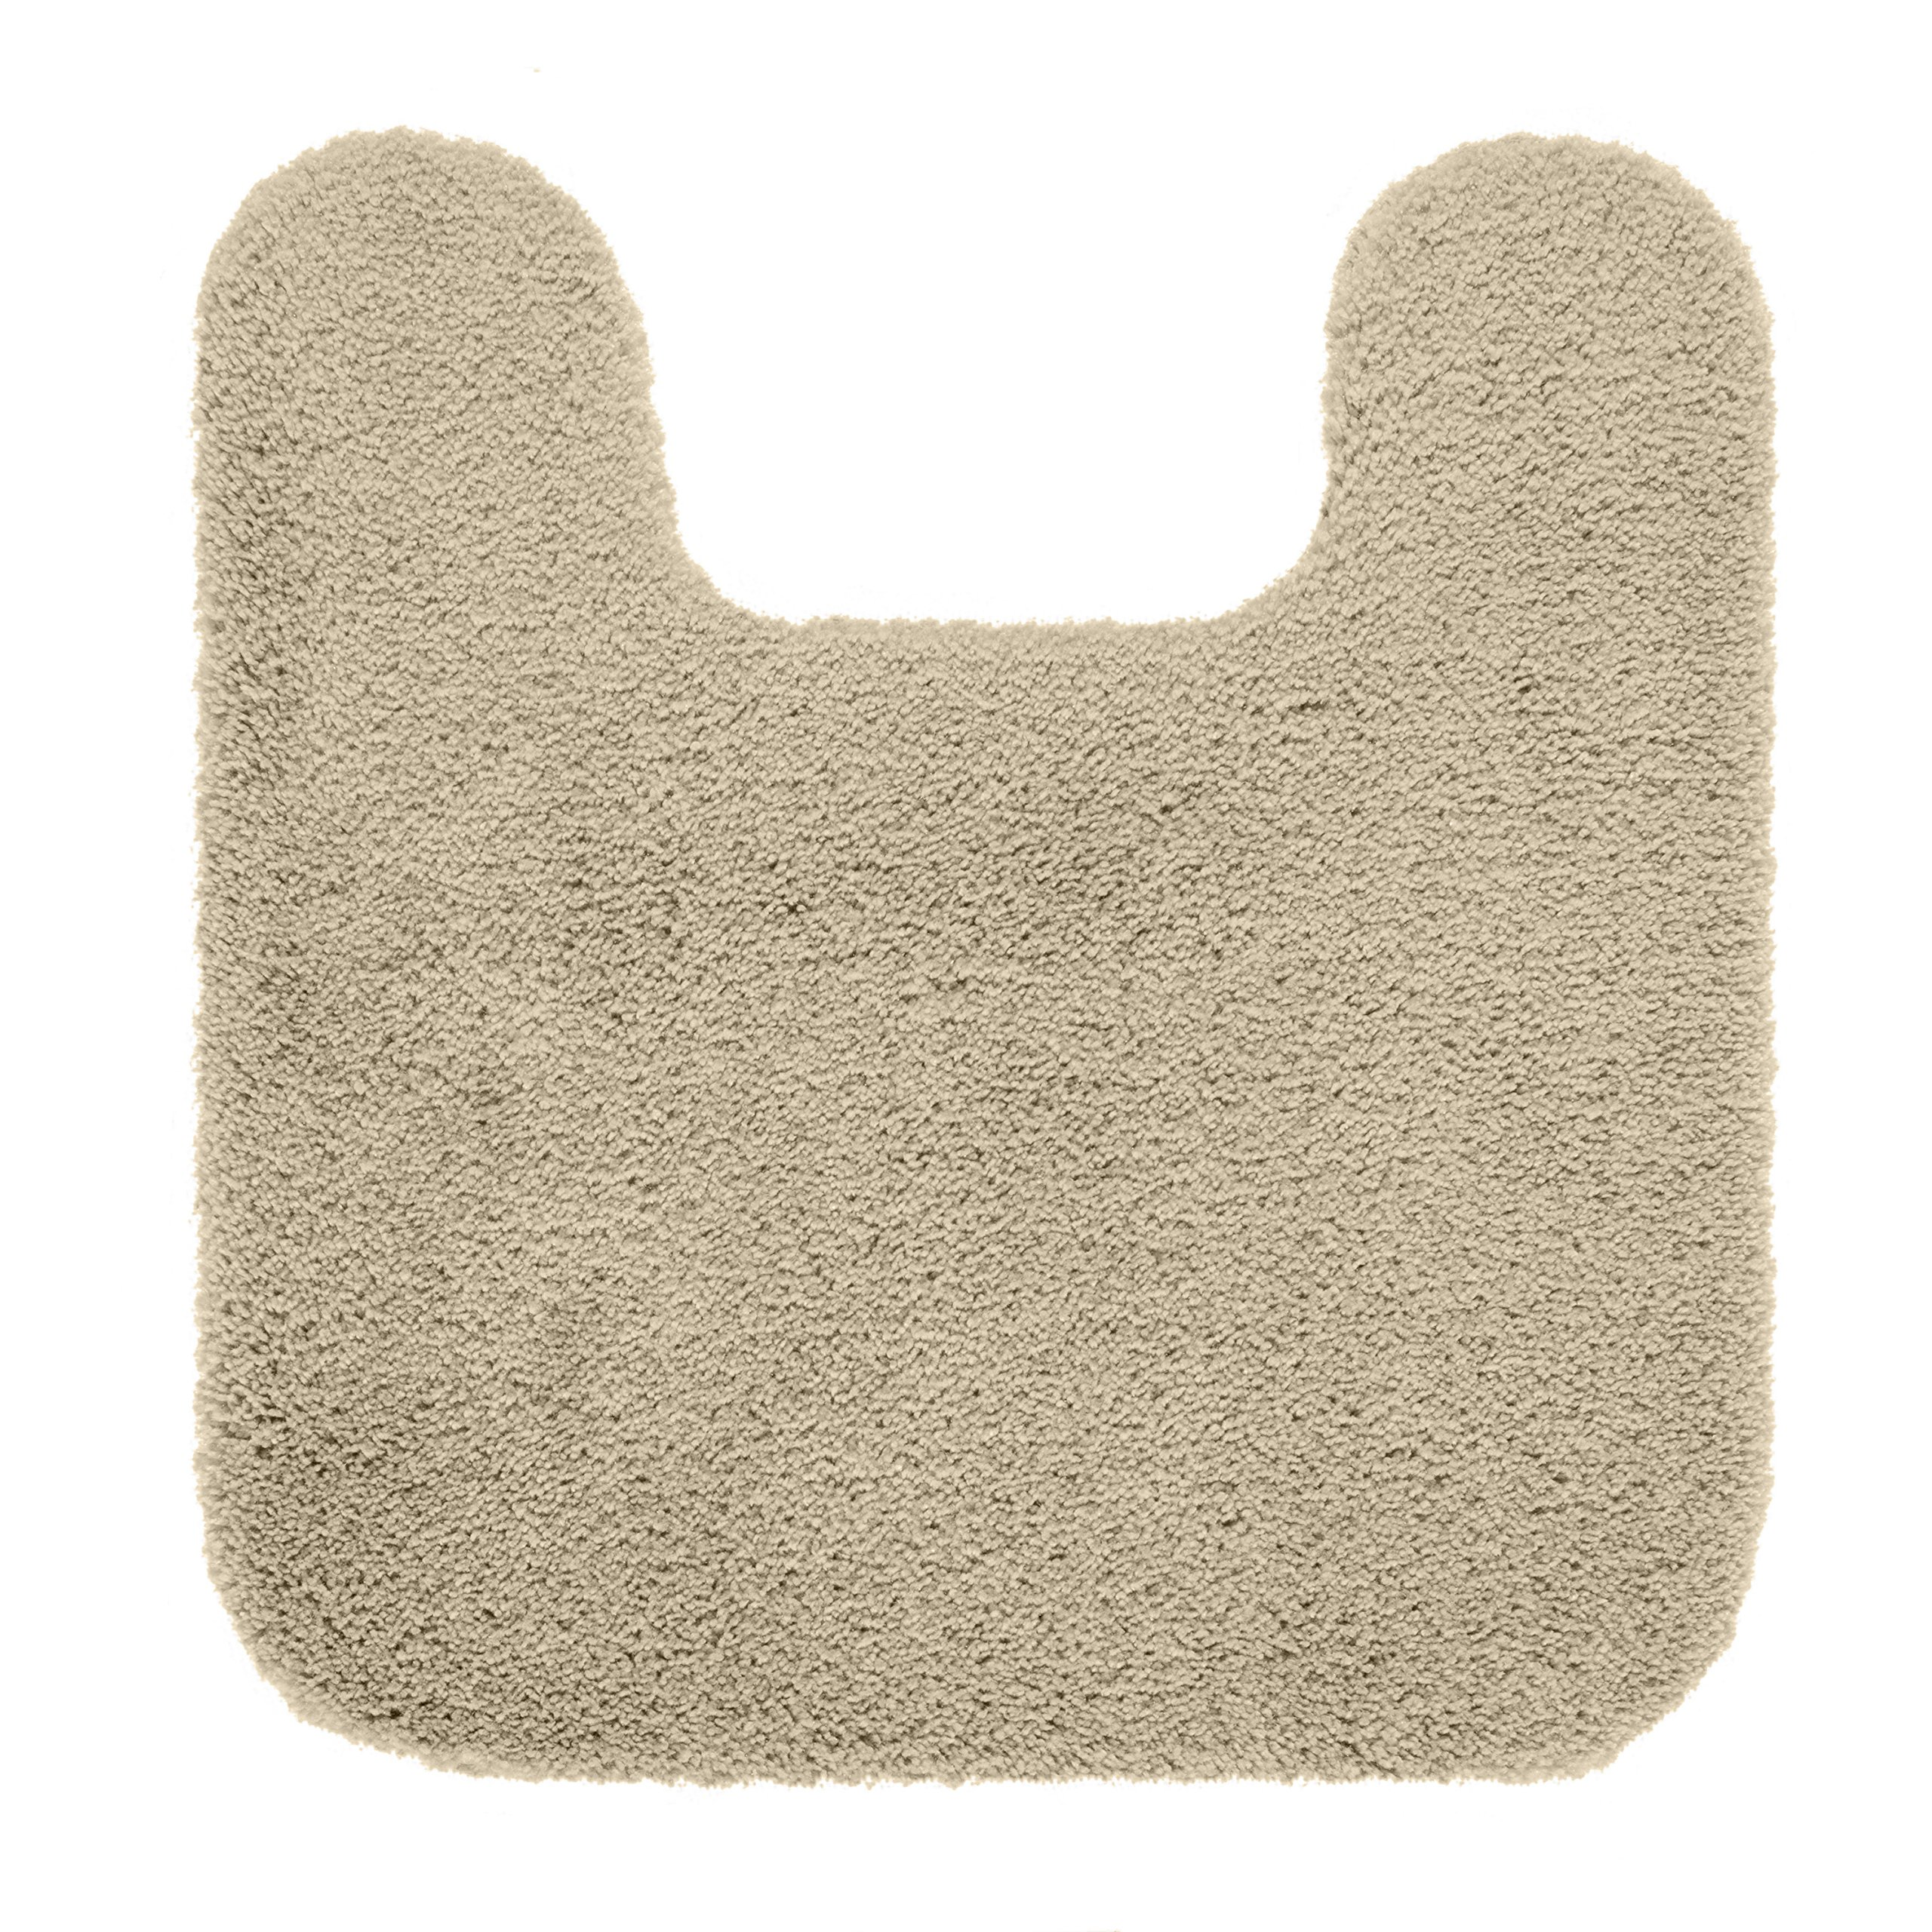 Maples Rugs Bathroom Rugs - Cloud Bath 20'' x 21.5'' Contour Non Slip Toilet Rug [Made in USA] Machine Washable Soft Bath Mat, Clay Beige